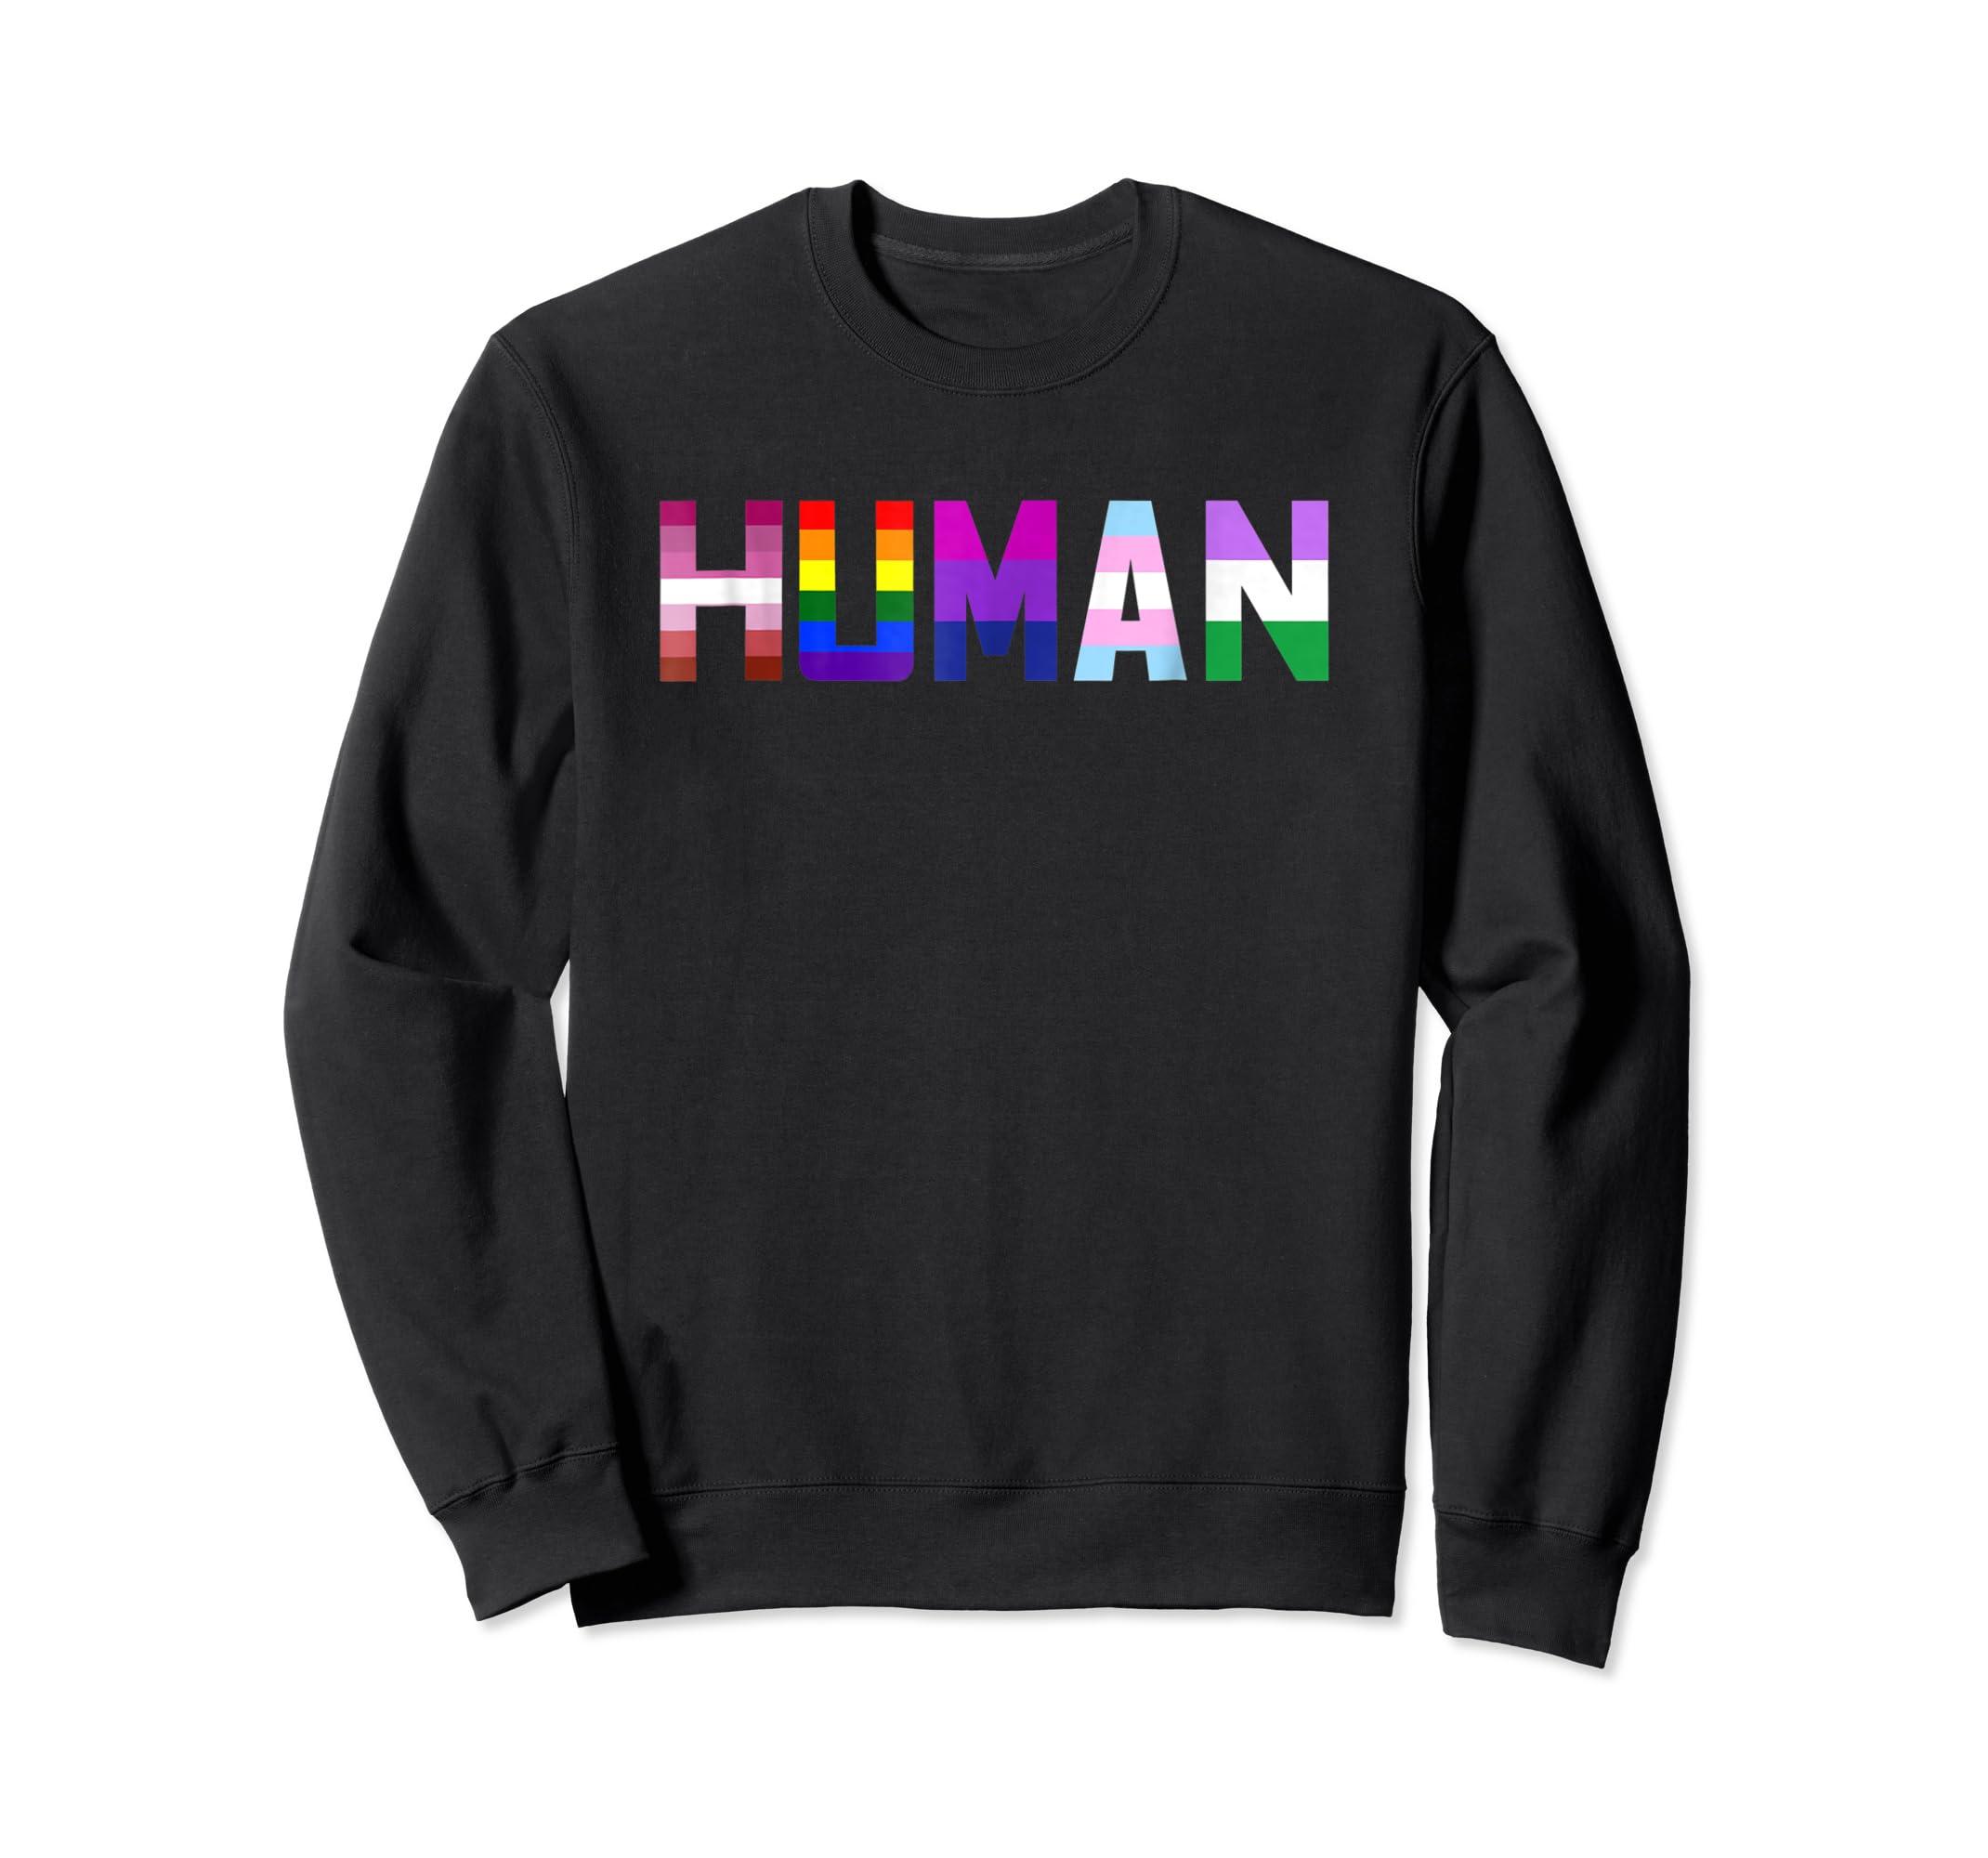 HUMAN Flag LGBT Gay Pride Month Transgender Ally T Shirt-Sweatshirt-Black